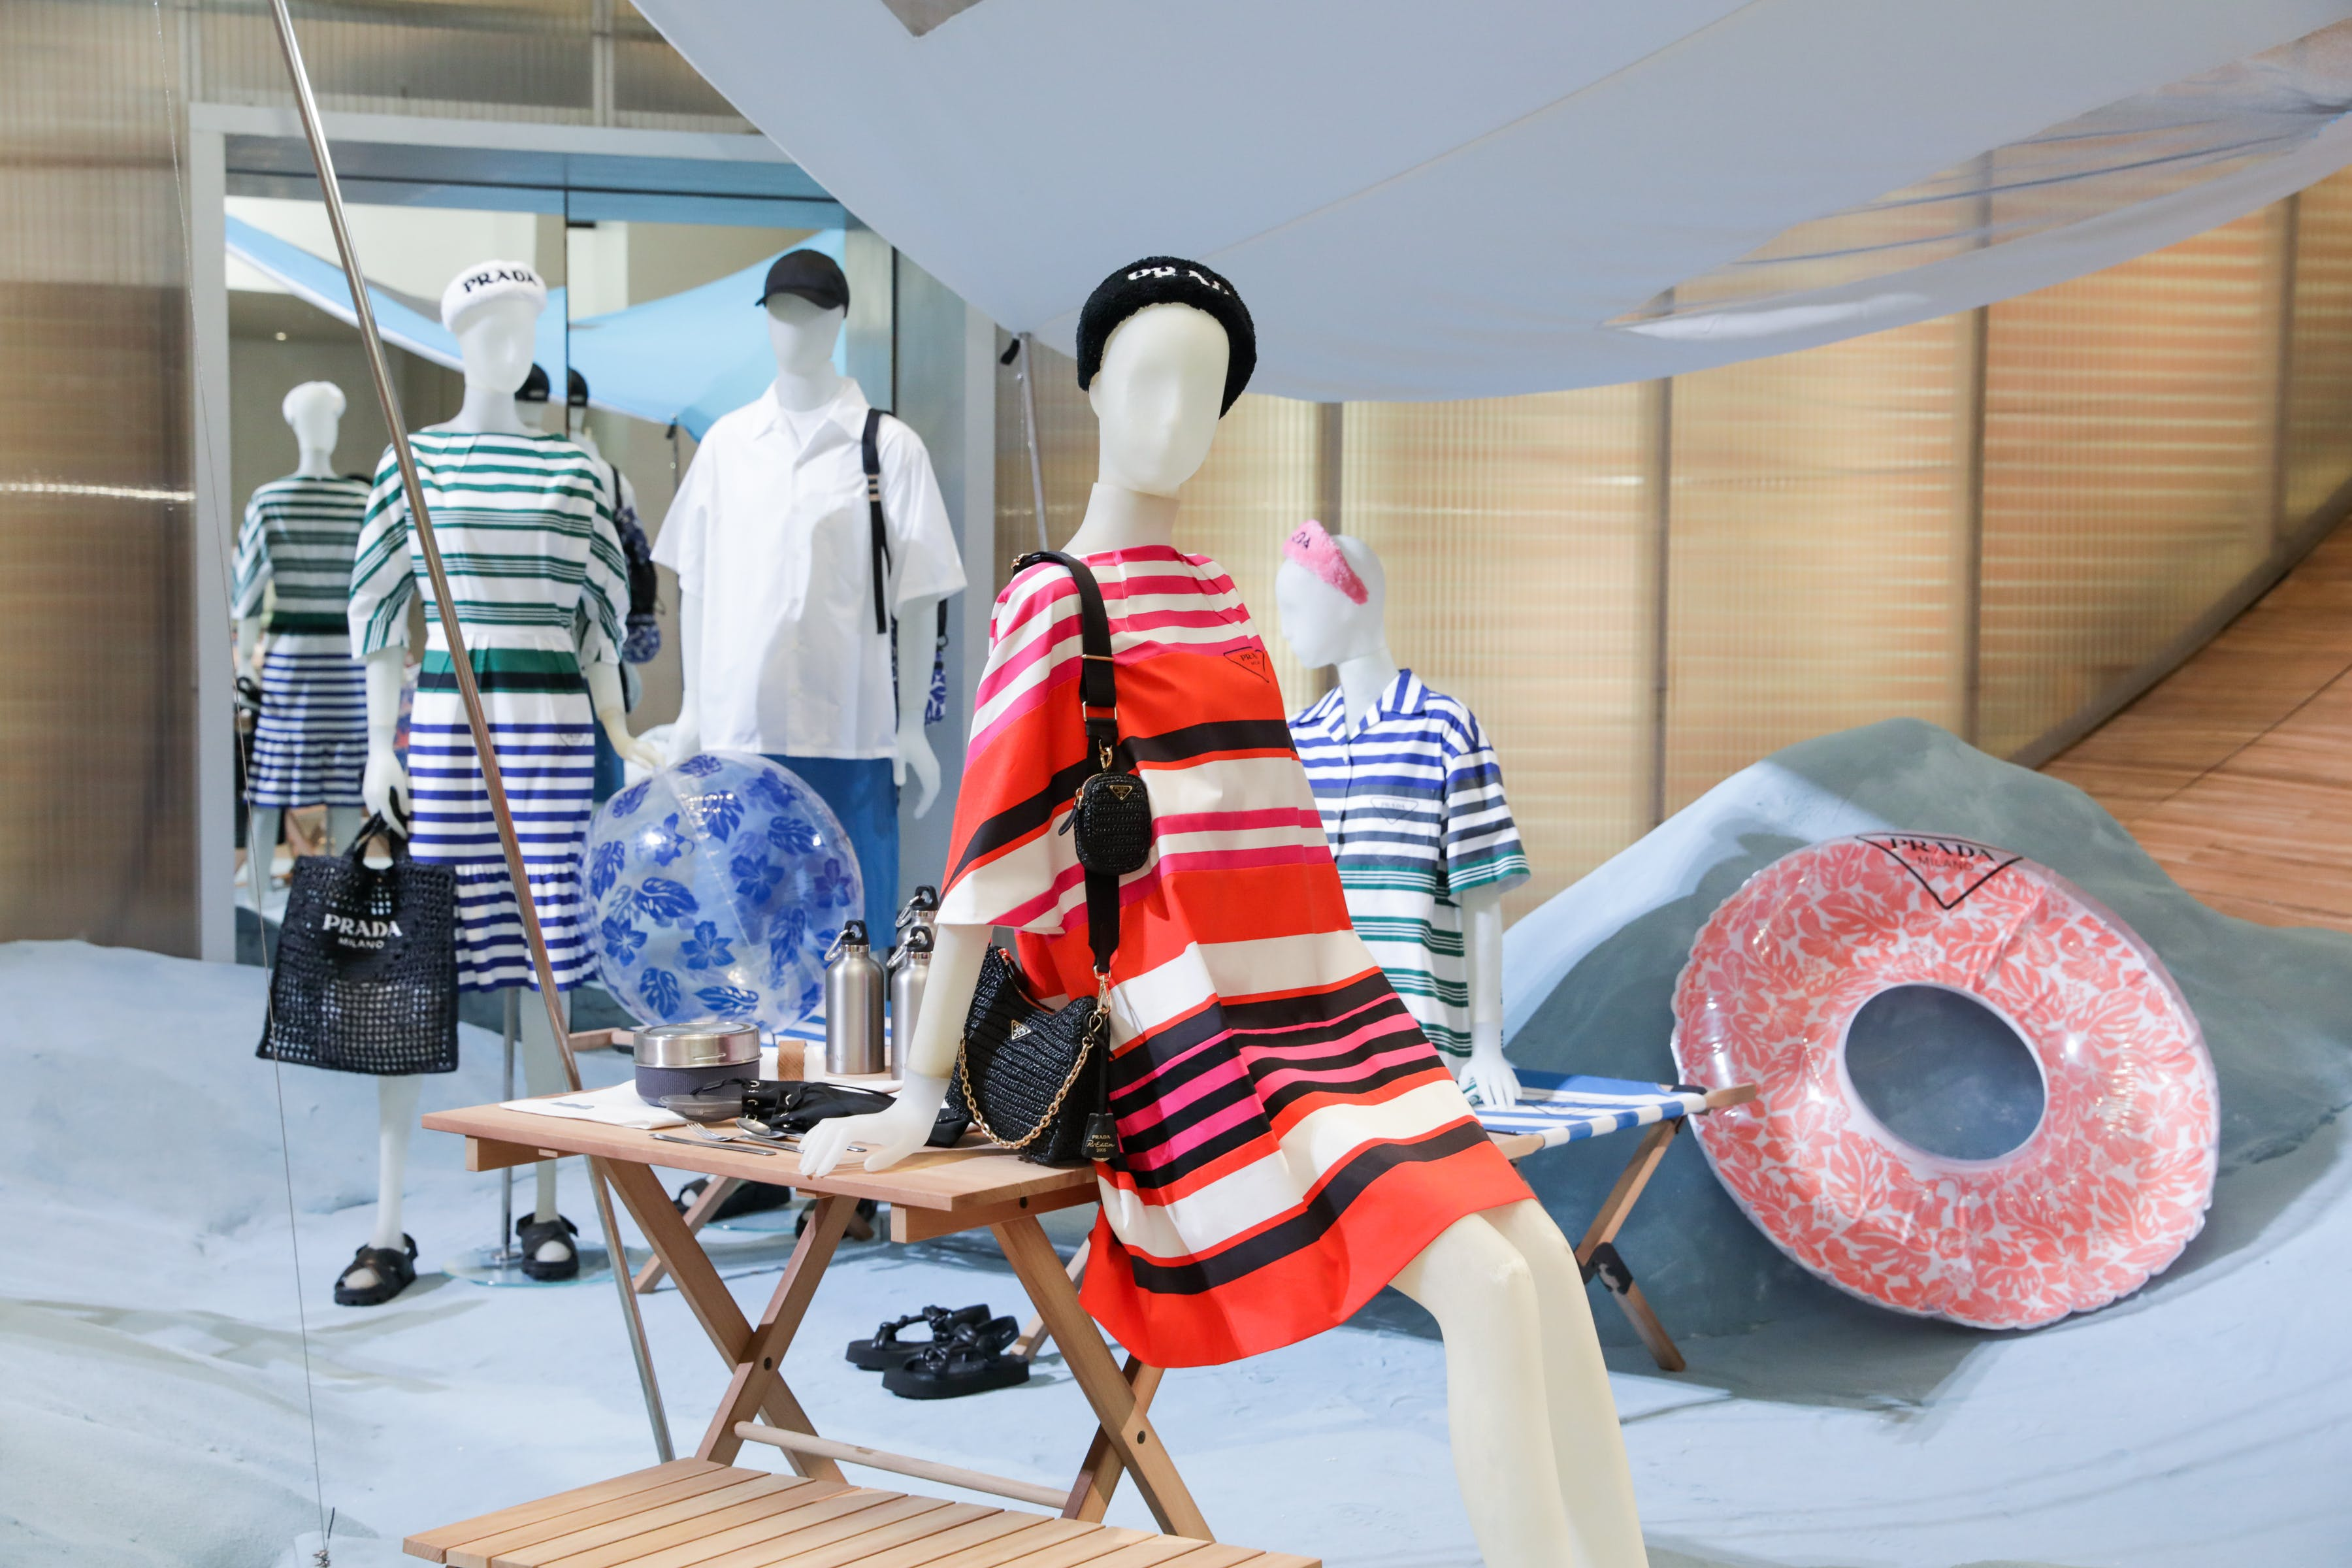 Prada 'Outdoor' pop-up at NYC store (summer - beach)